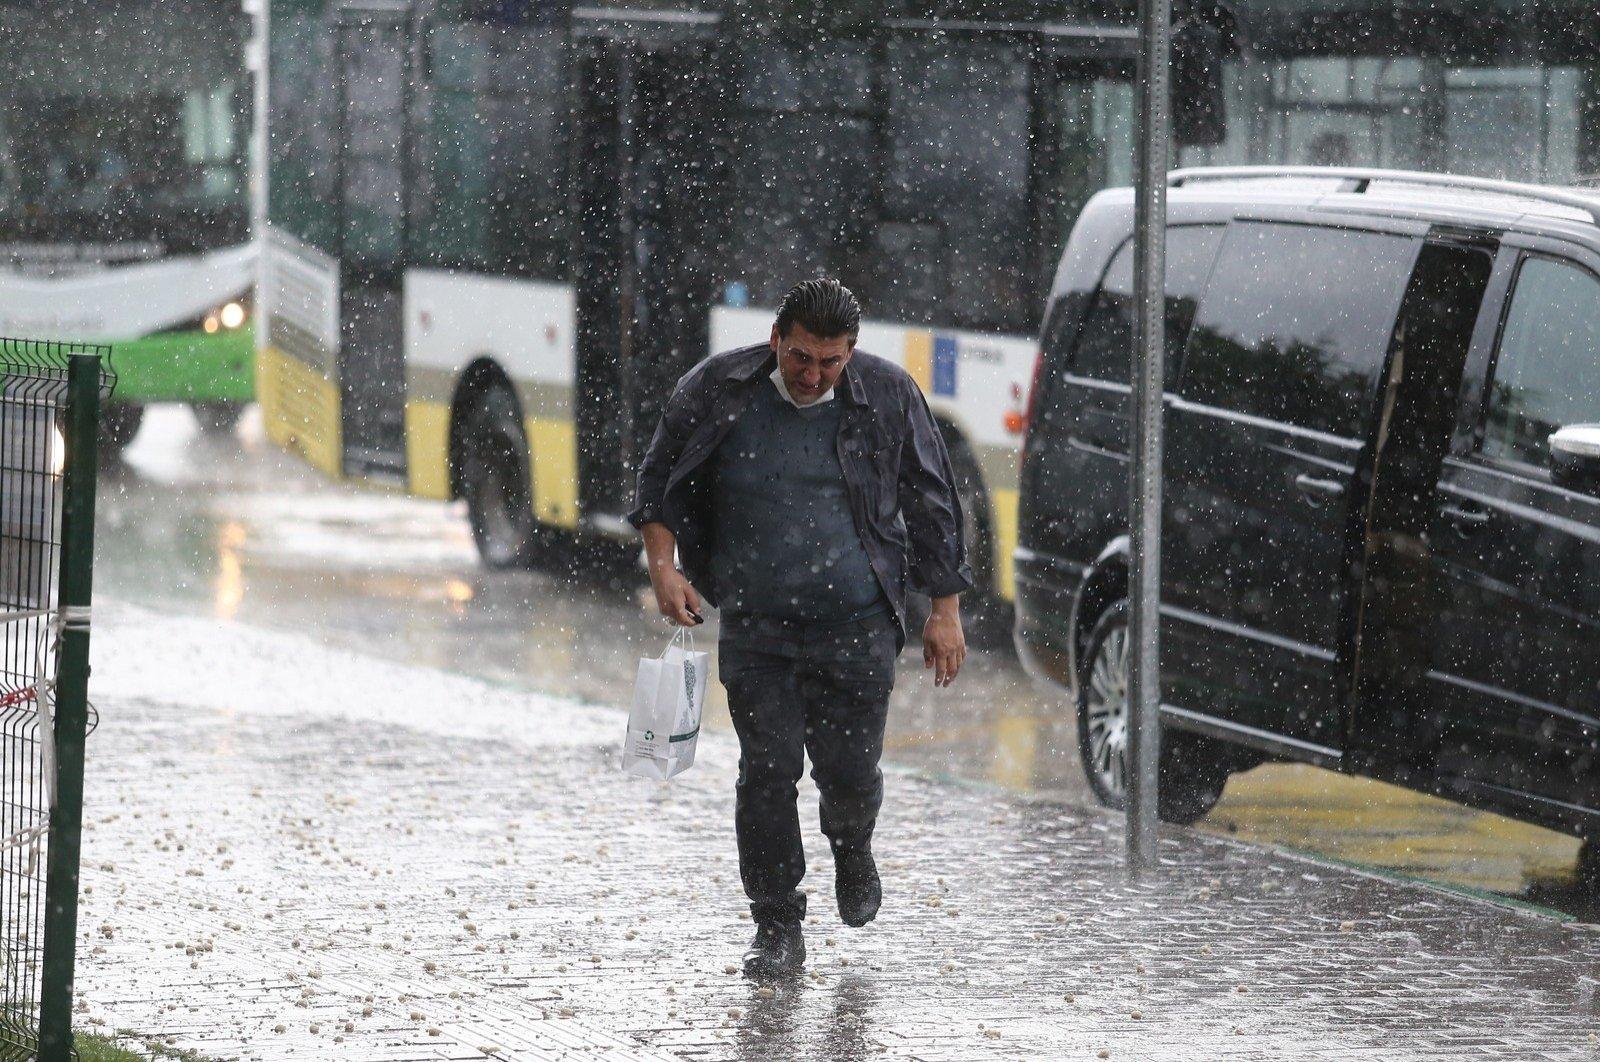 A man runs for cover under heavy rain in Bursa, Turkey, June 23, 2020. (IHA Photo)